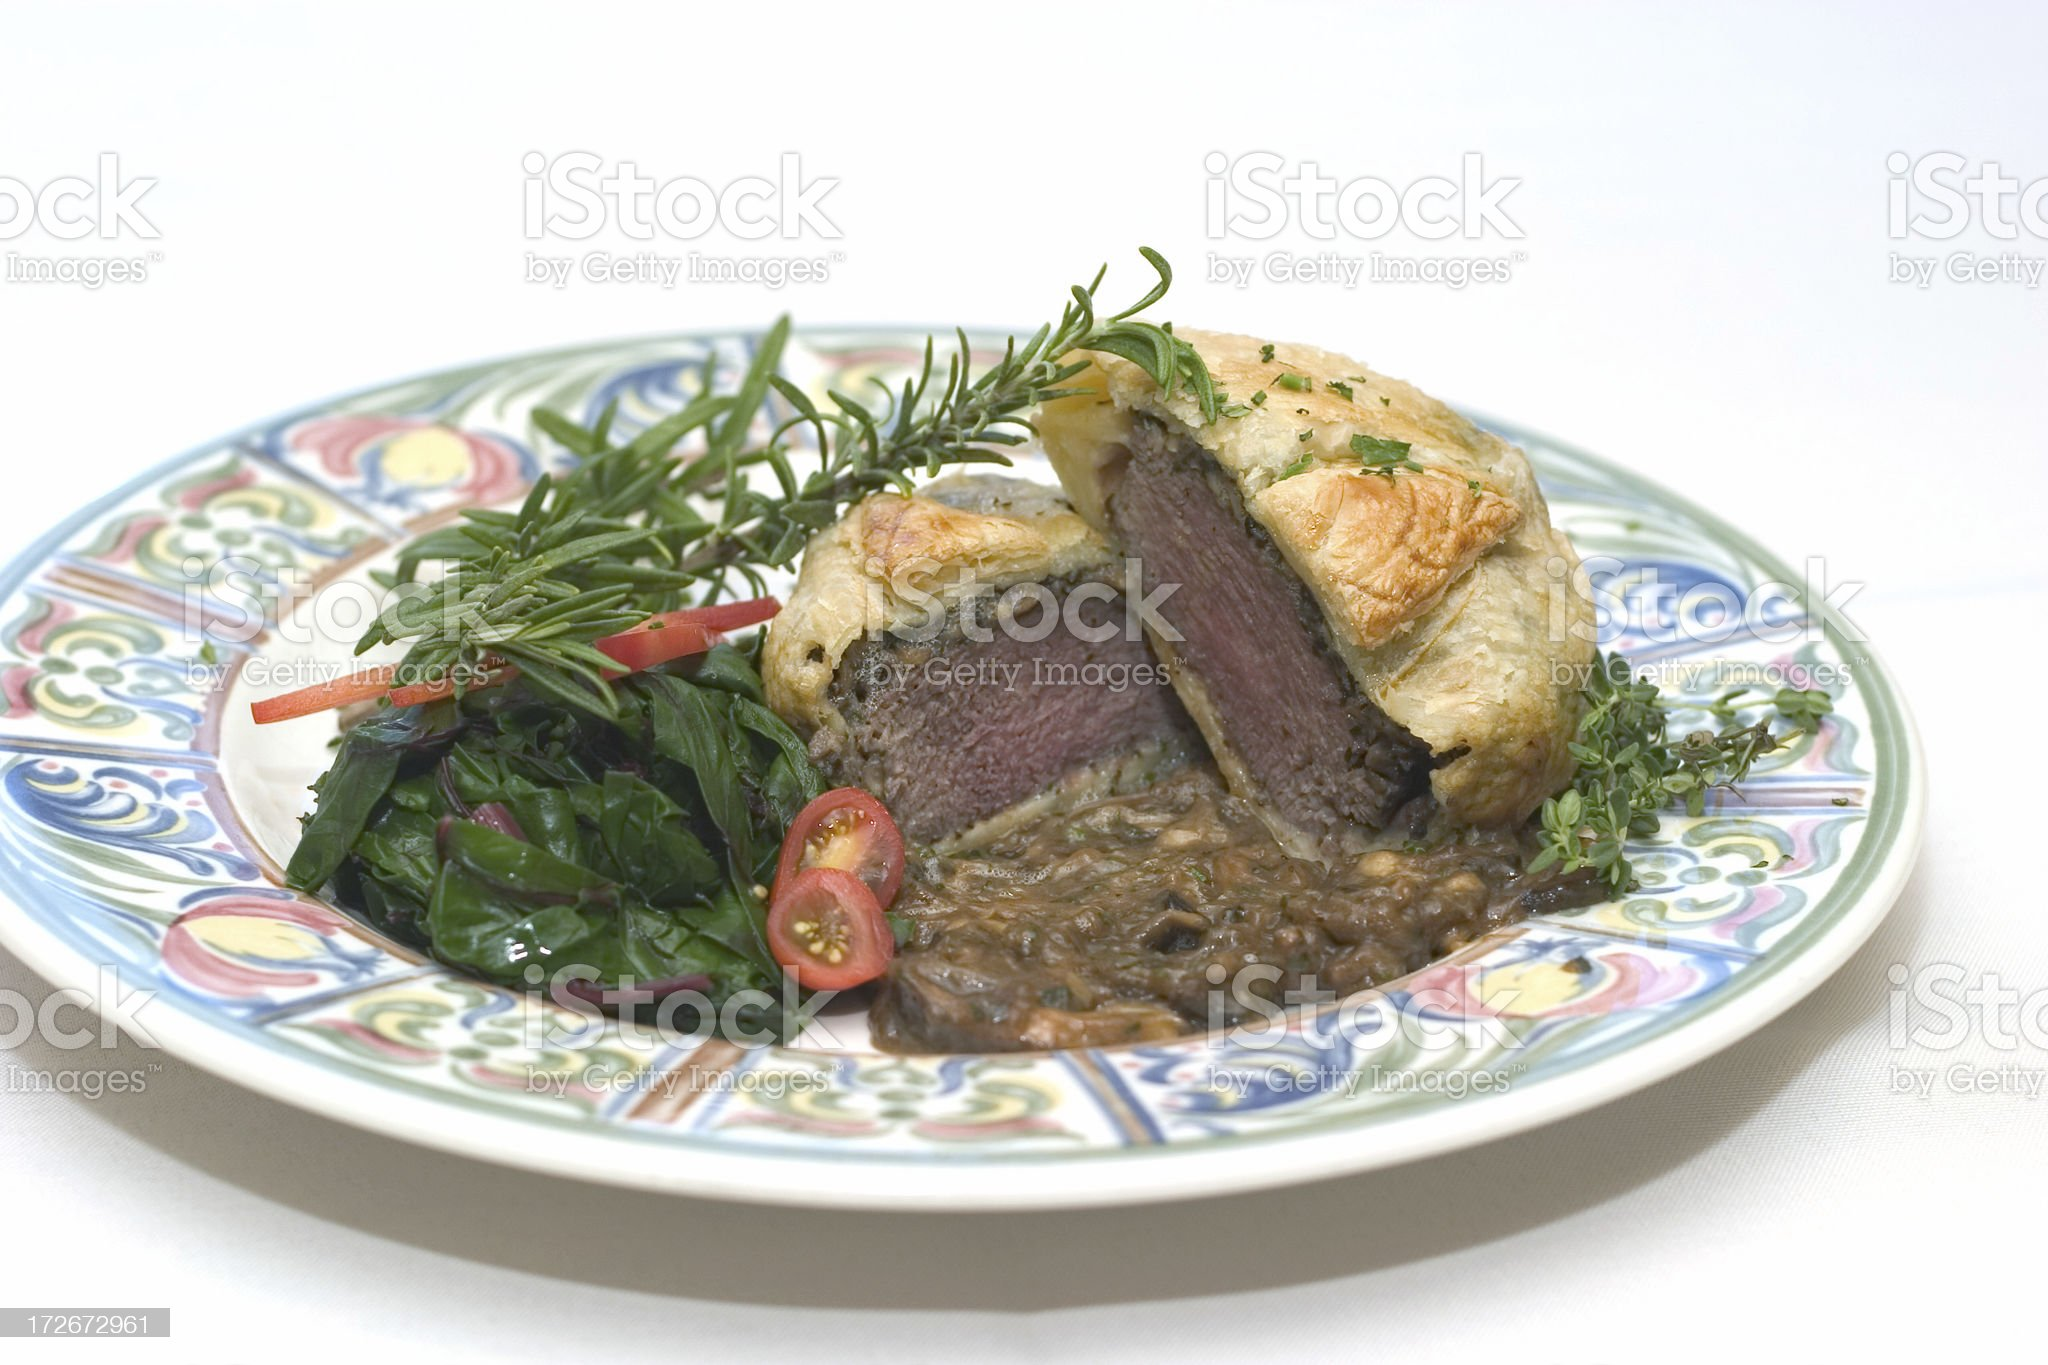 Beef Wellington royalty-free stock photo